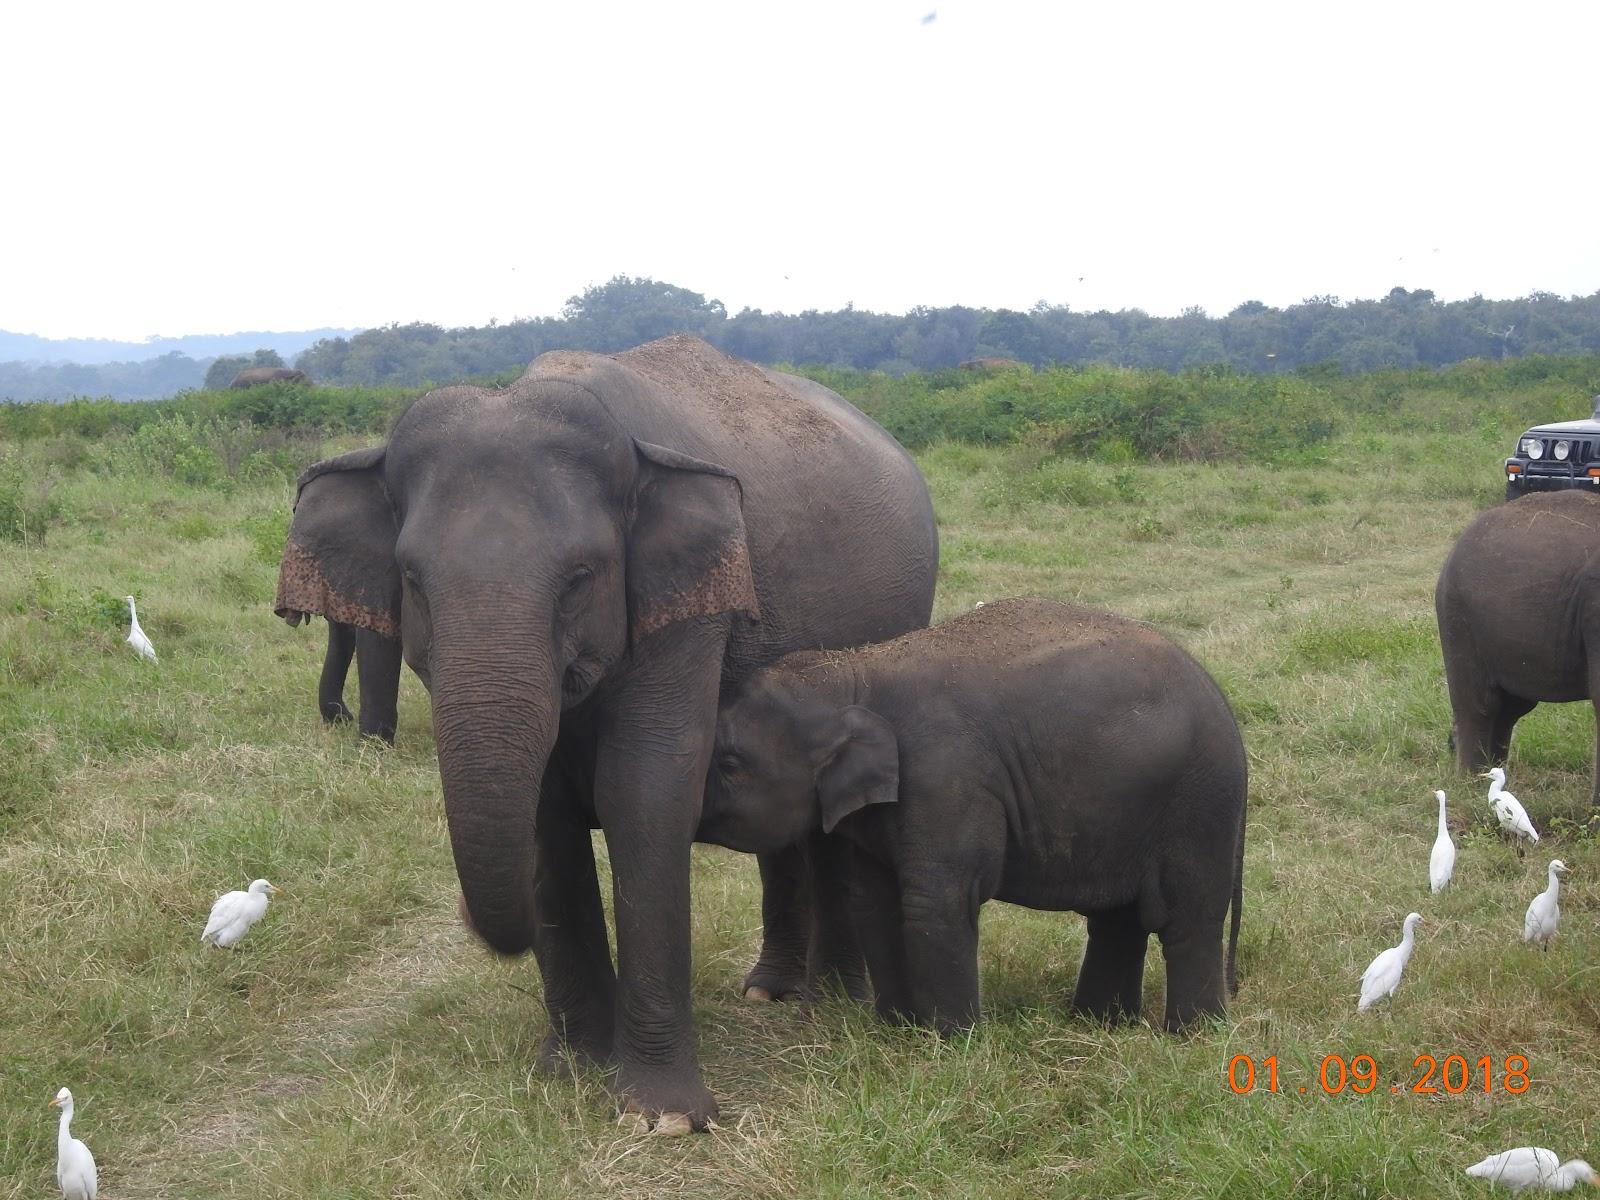 invite-to-paradise-sri-lanka-maldives-holiday-specialists-nutan-vidyut-patel-elephants-4.jpg